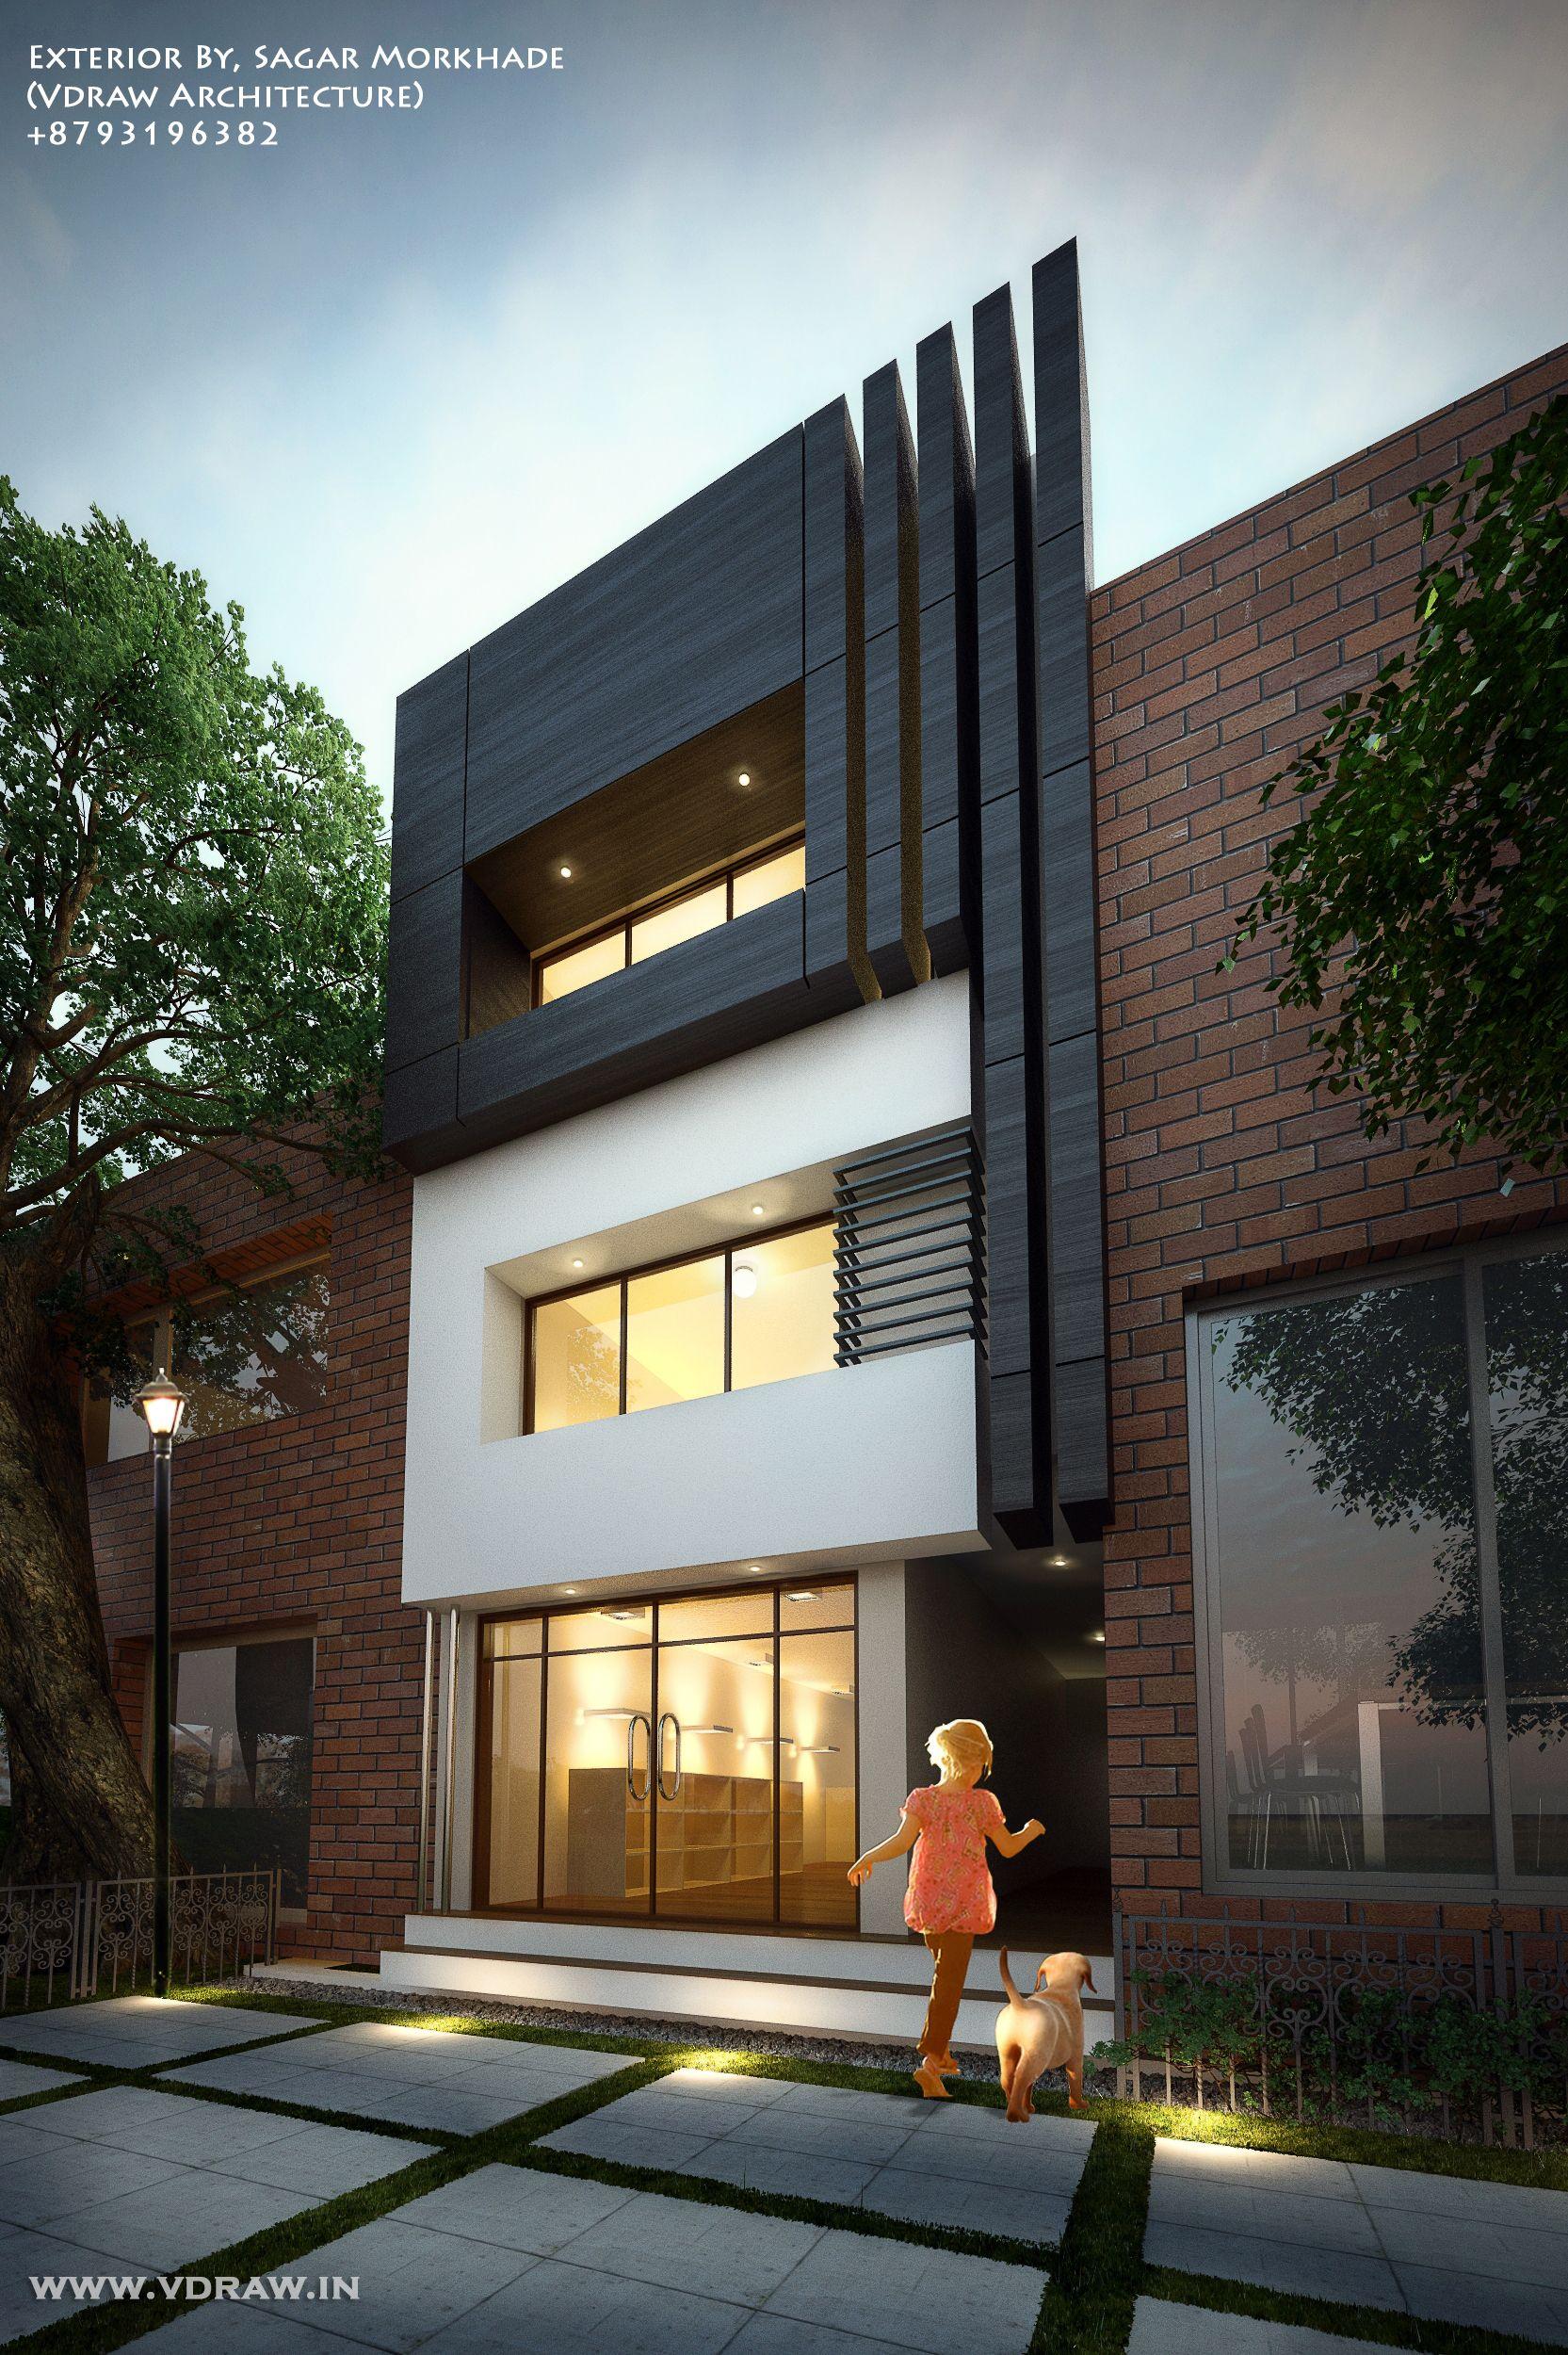 Exterior By Sagar Morkhade Vdraw Architecture 8793196382: Exterior By, Sagar Morkhade (Vdraw Architecture) +8793196382